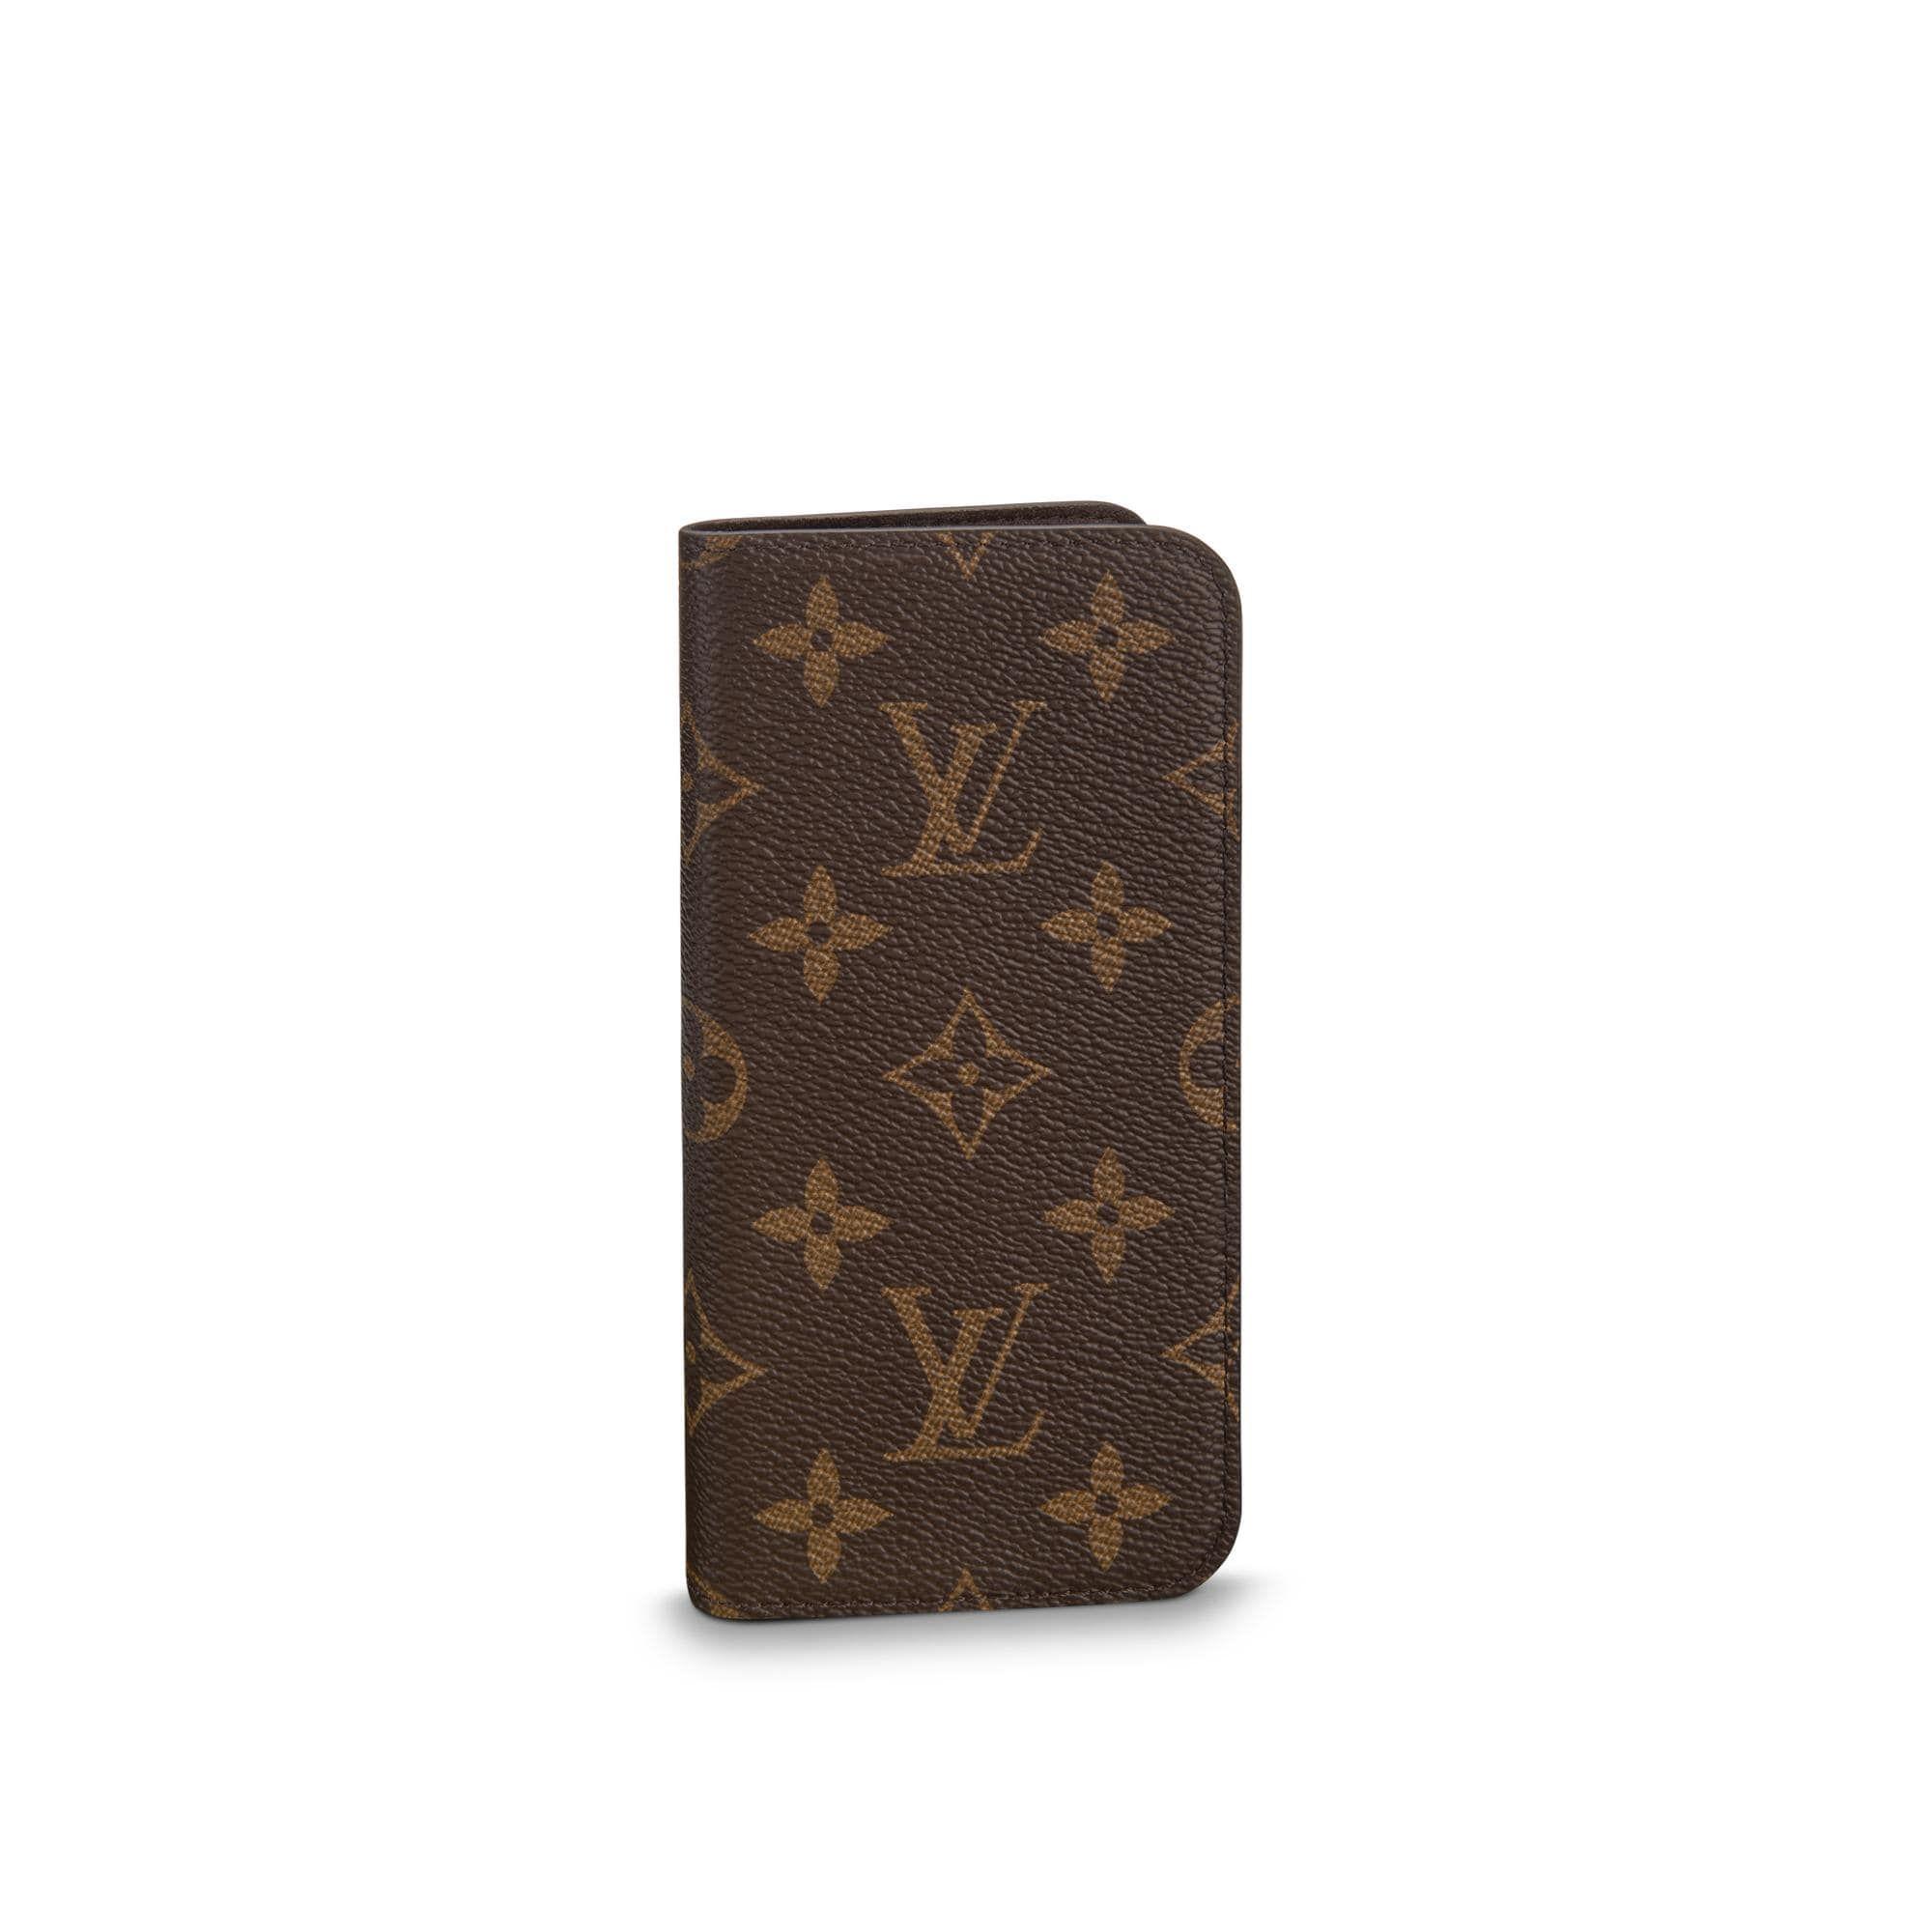 Iphone X Folio Via Louis Vuitton Louis Vuitton Red Louis Vuitton Collection Louis Vuitton Wallet